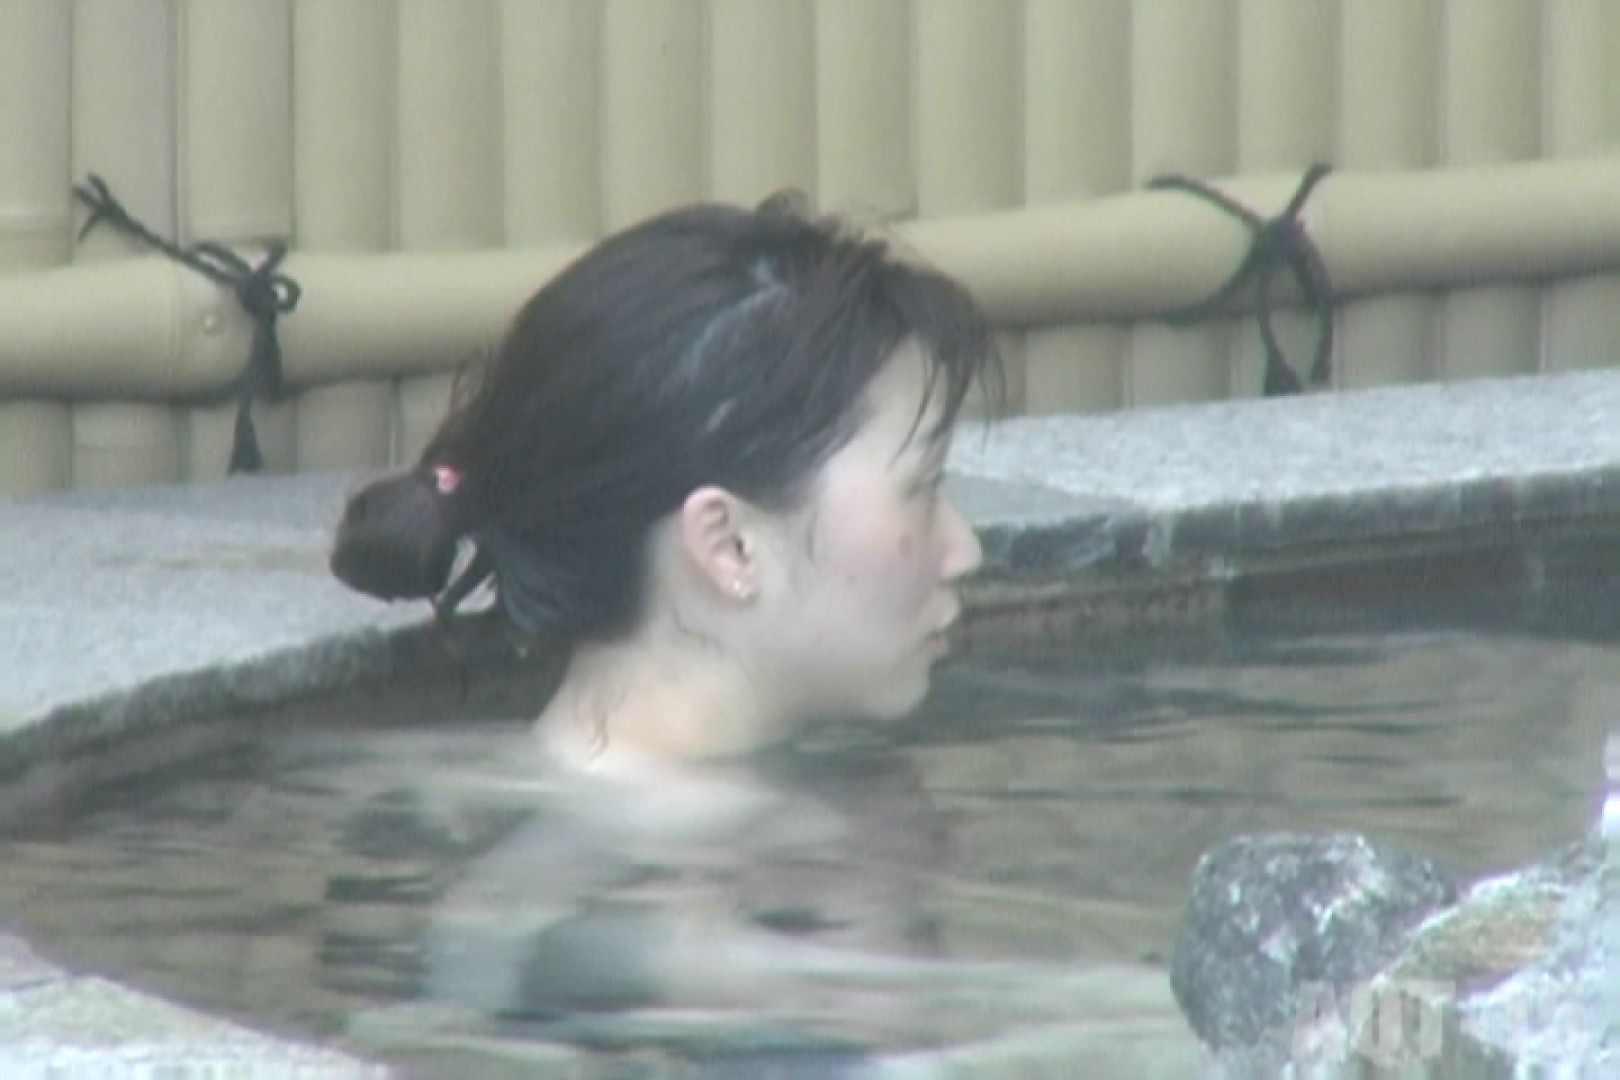 Aquaな露天風呂Vol.831 露天   HなOL  99pic 63